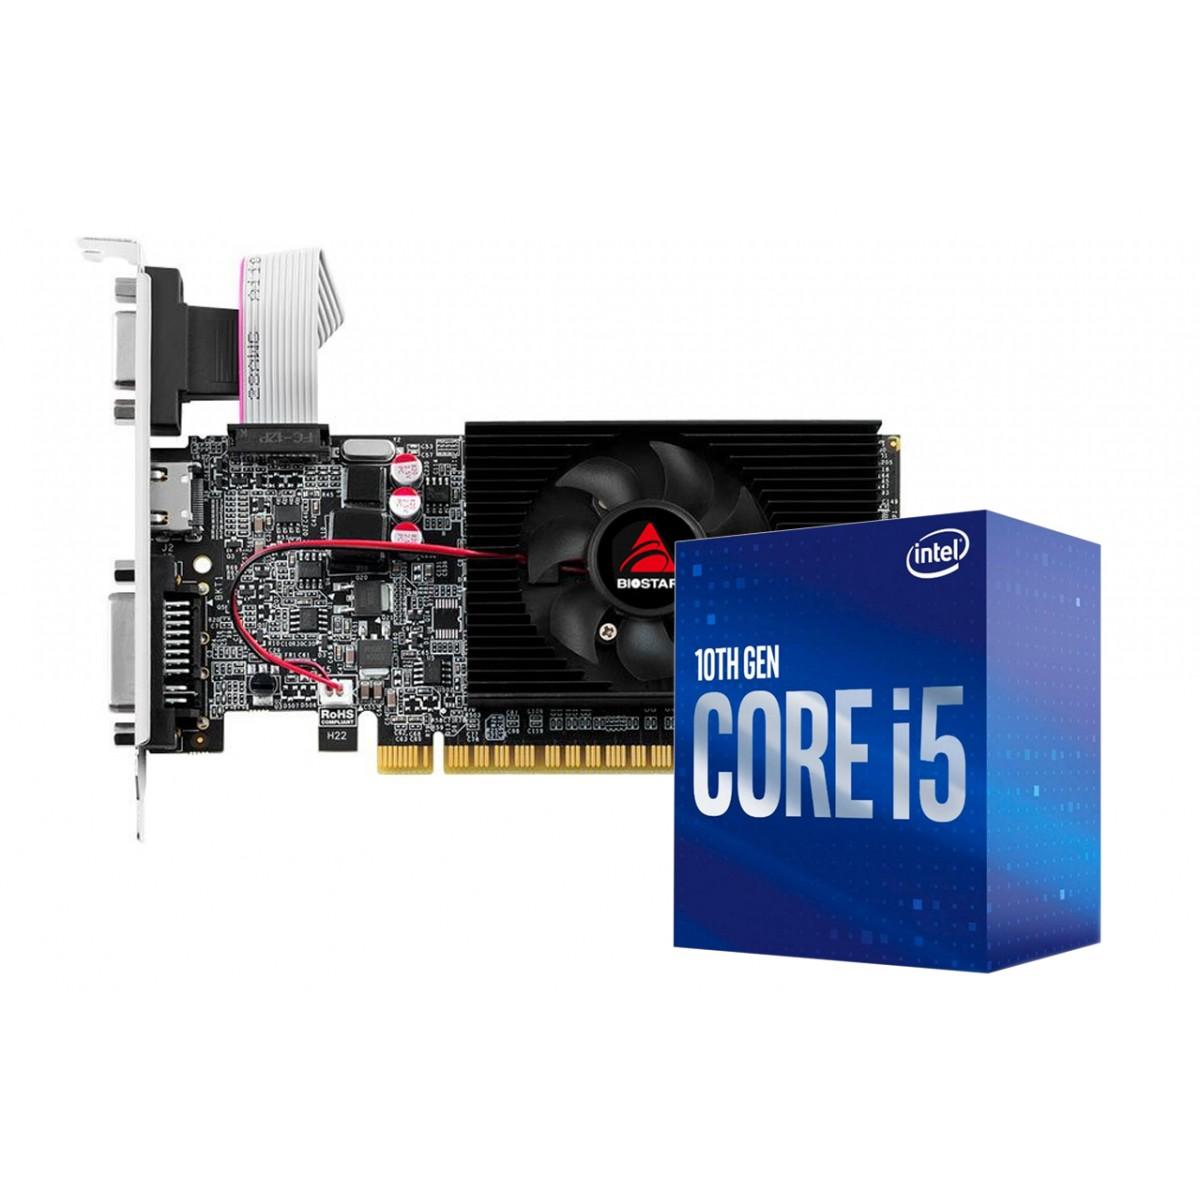 Kit Upgrade Biostar NVIDIA GeForce GT 610 2GB + Processador Intel Core i5 10400F